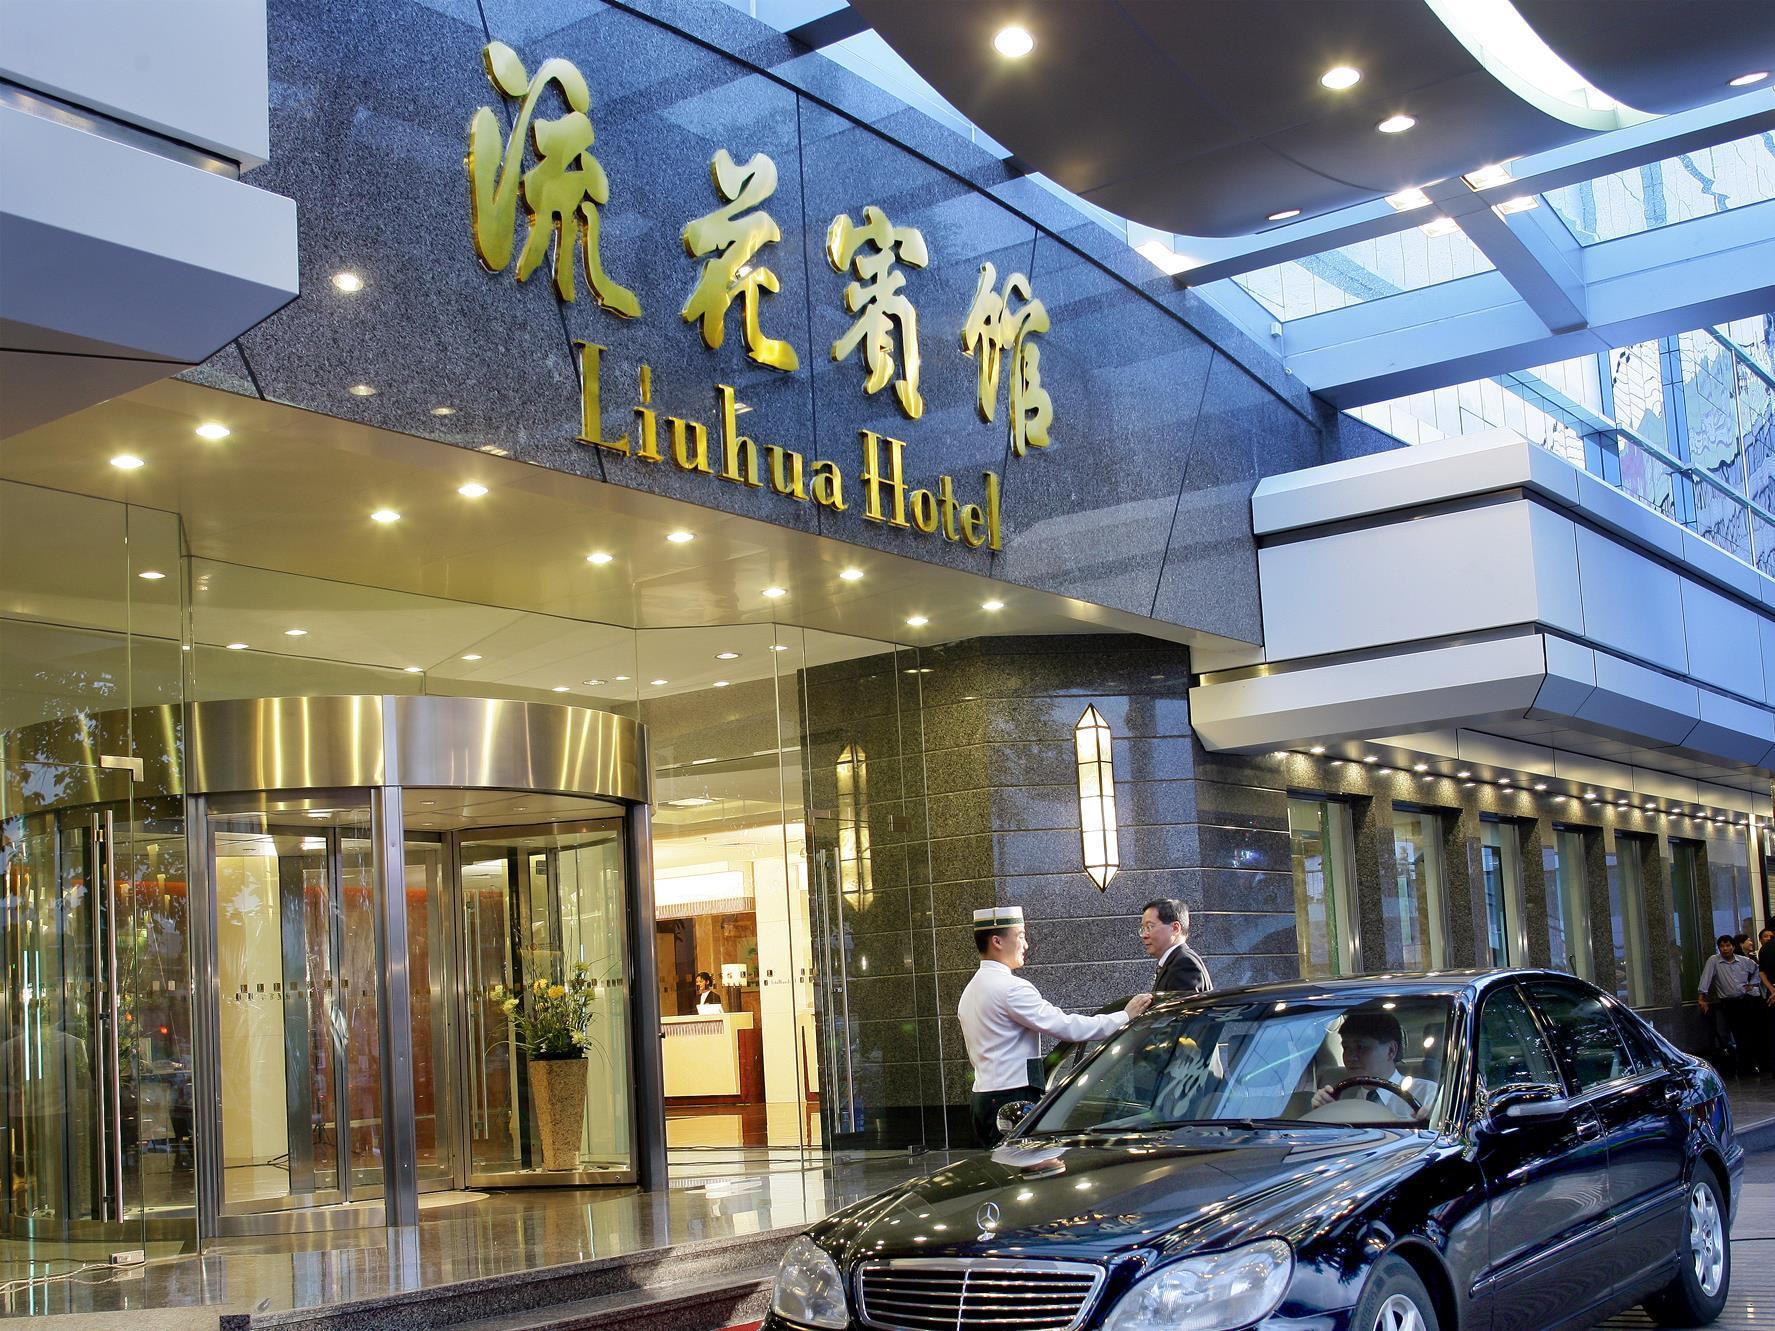 Liuhua Hotel